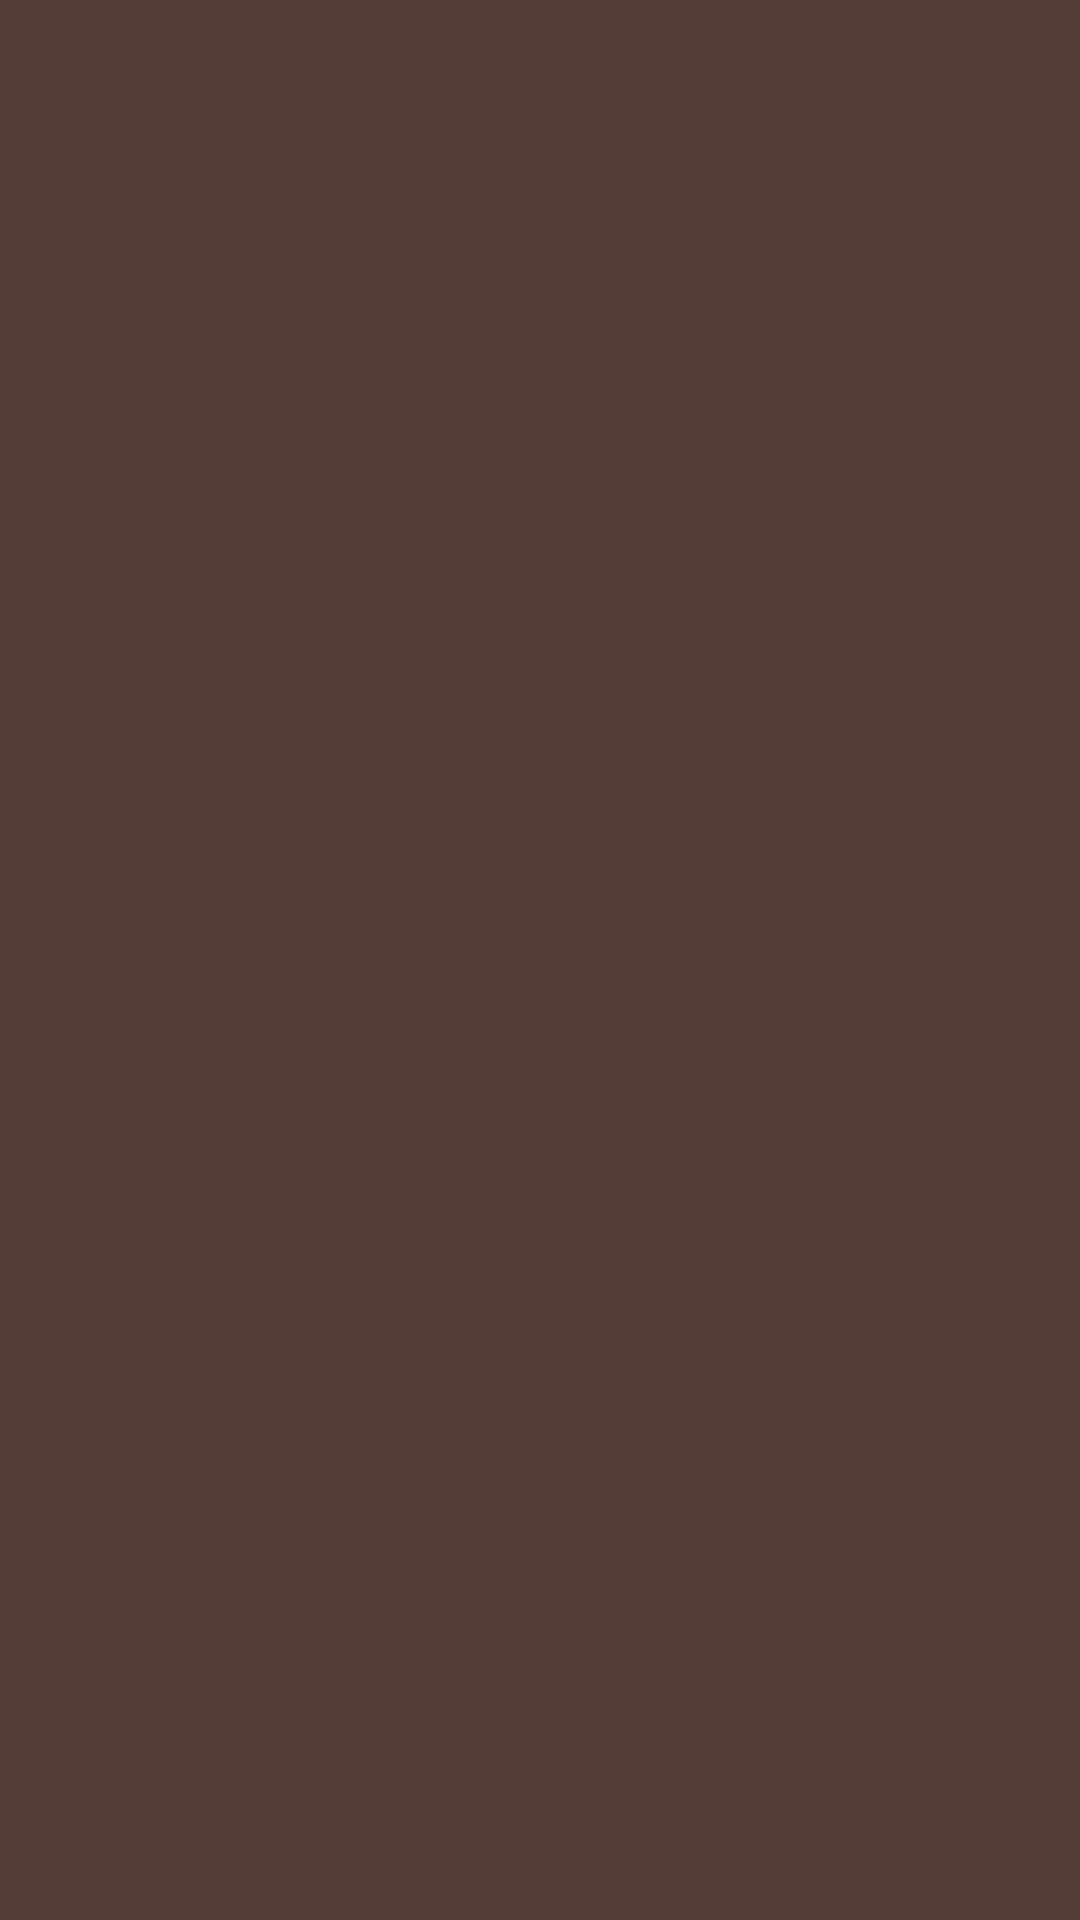 1080x1920 Dark Liver Horses Solid Color Background